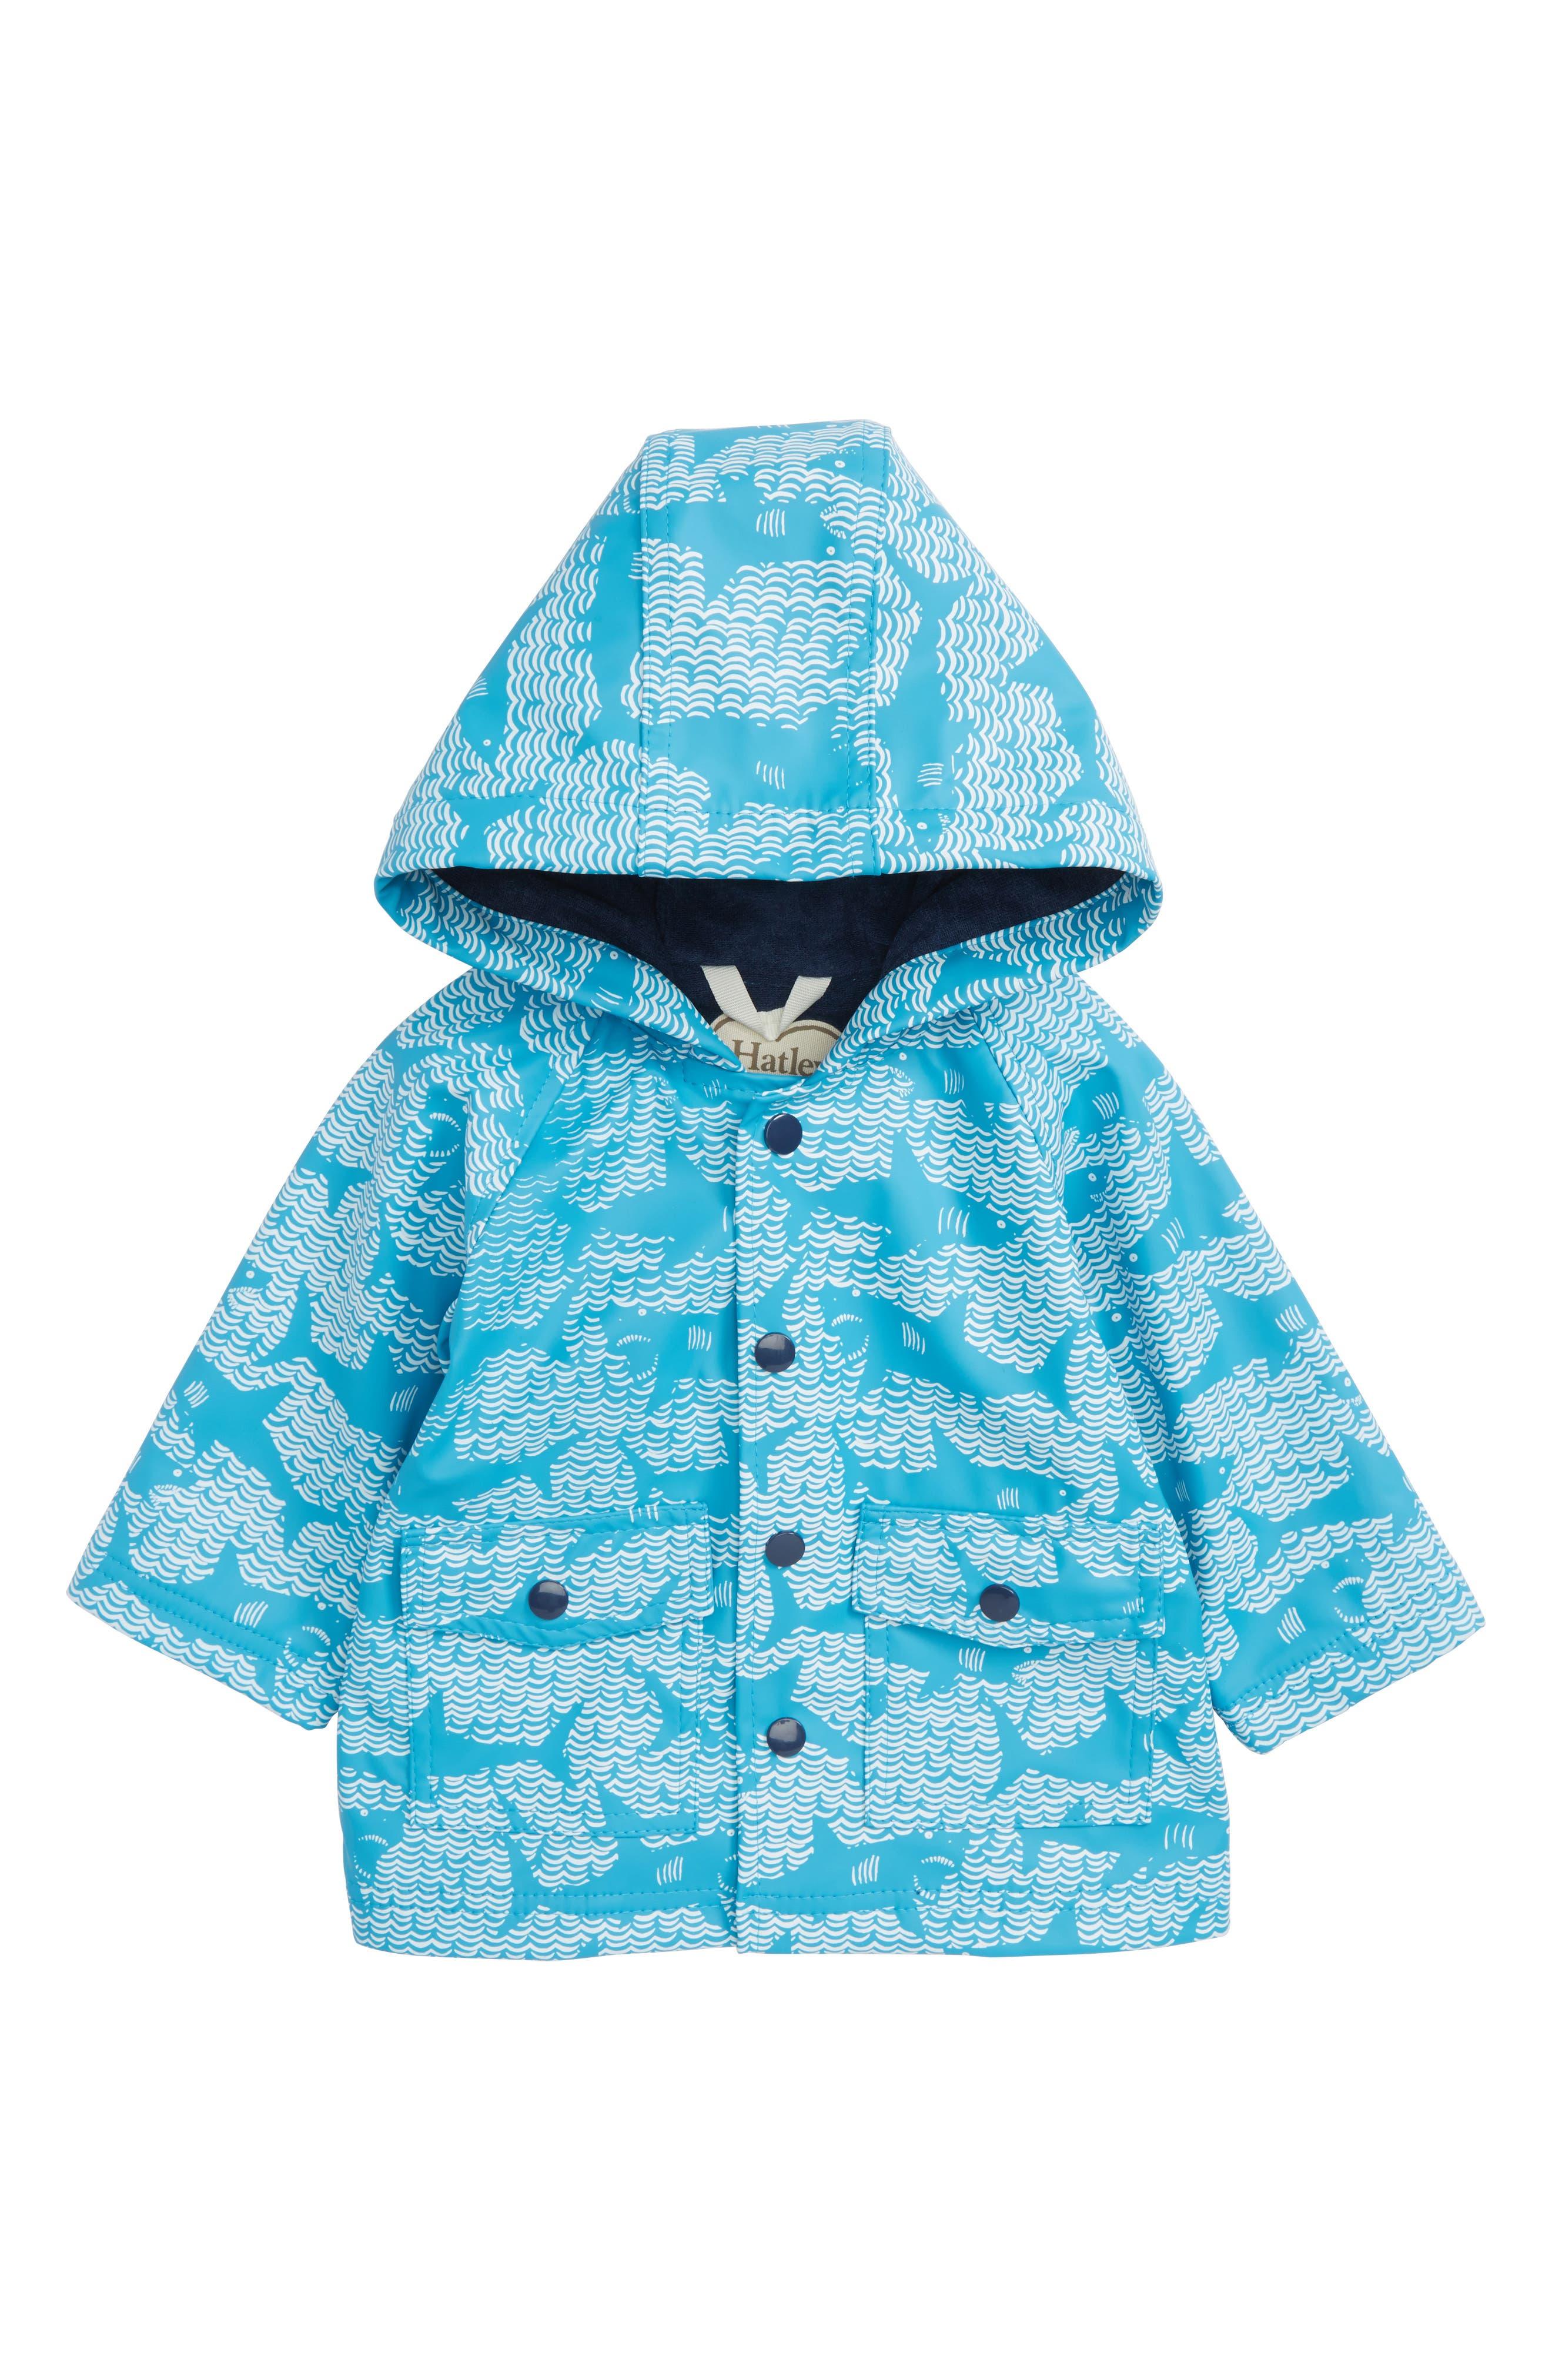 Shark Alley Hooded Raincoat,                         Main,                         color, Shark Alley